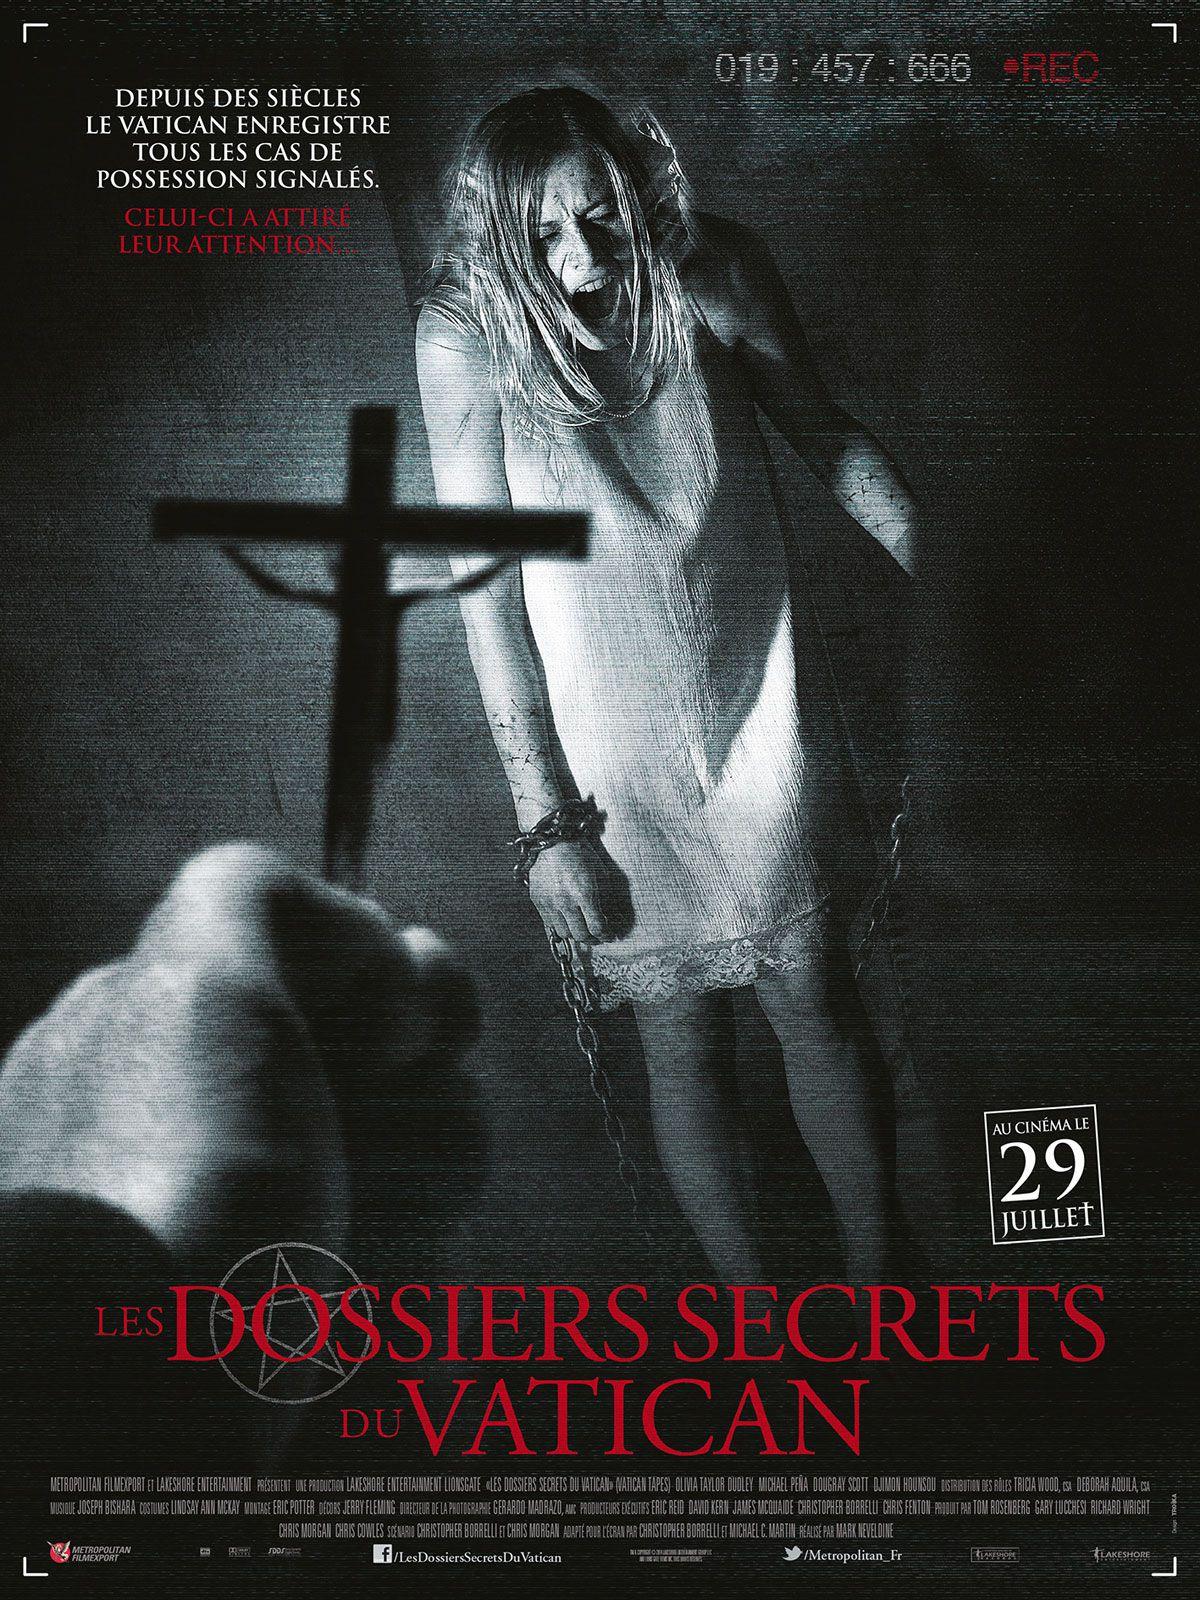 Les Dossiers secrets du Vatican - Film (2015)